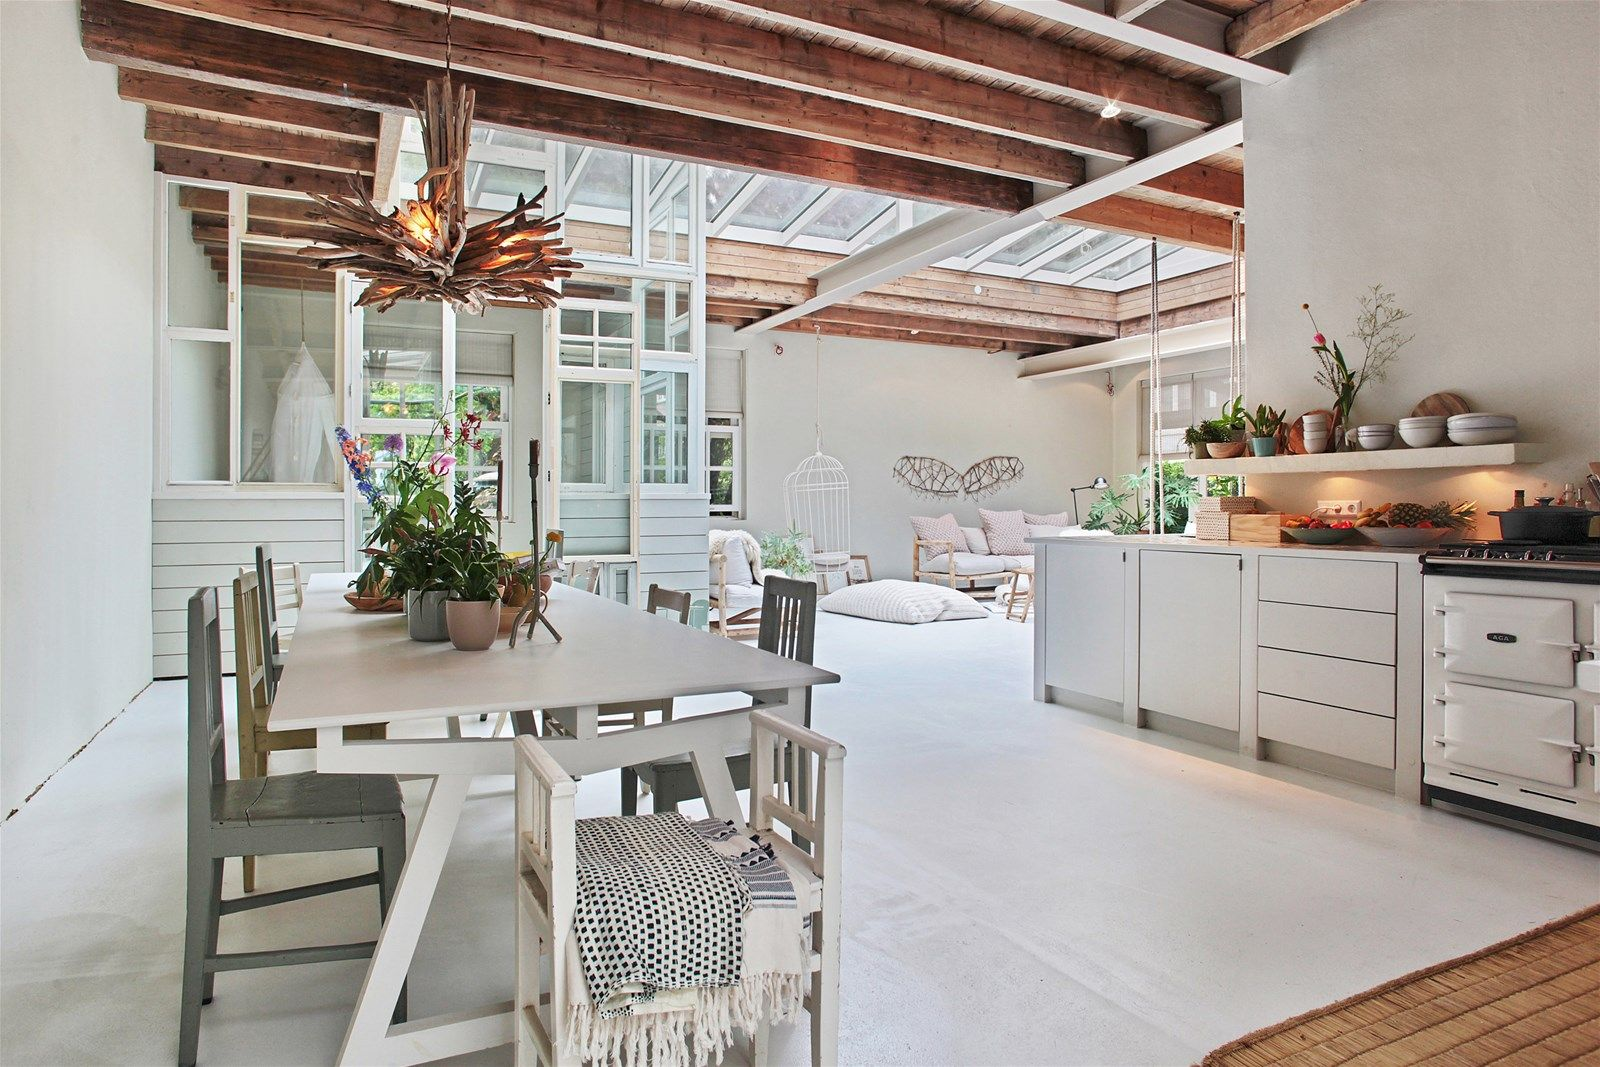 projectfairytale: Light Filled Amsterdam Loft | Ideas for the House ...